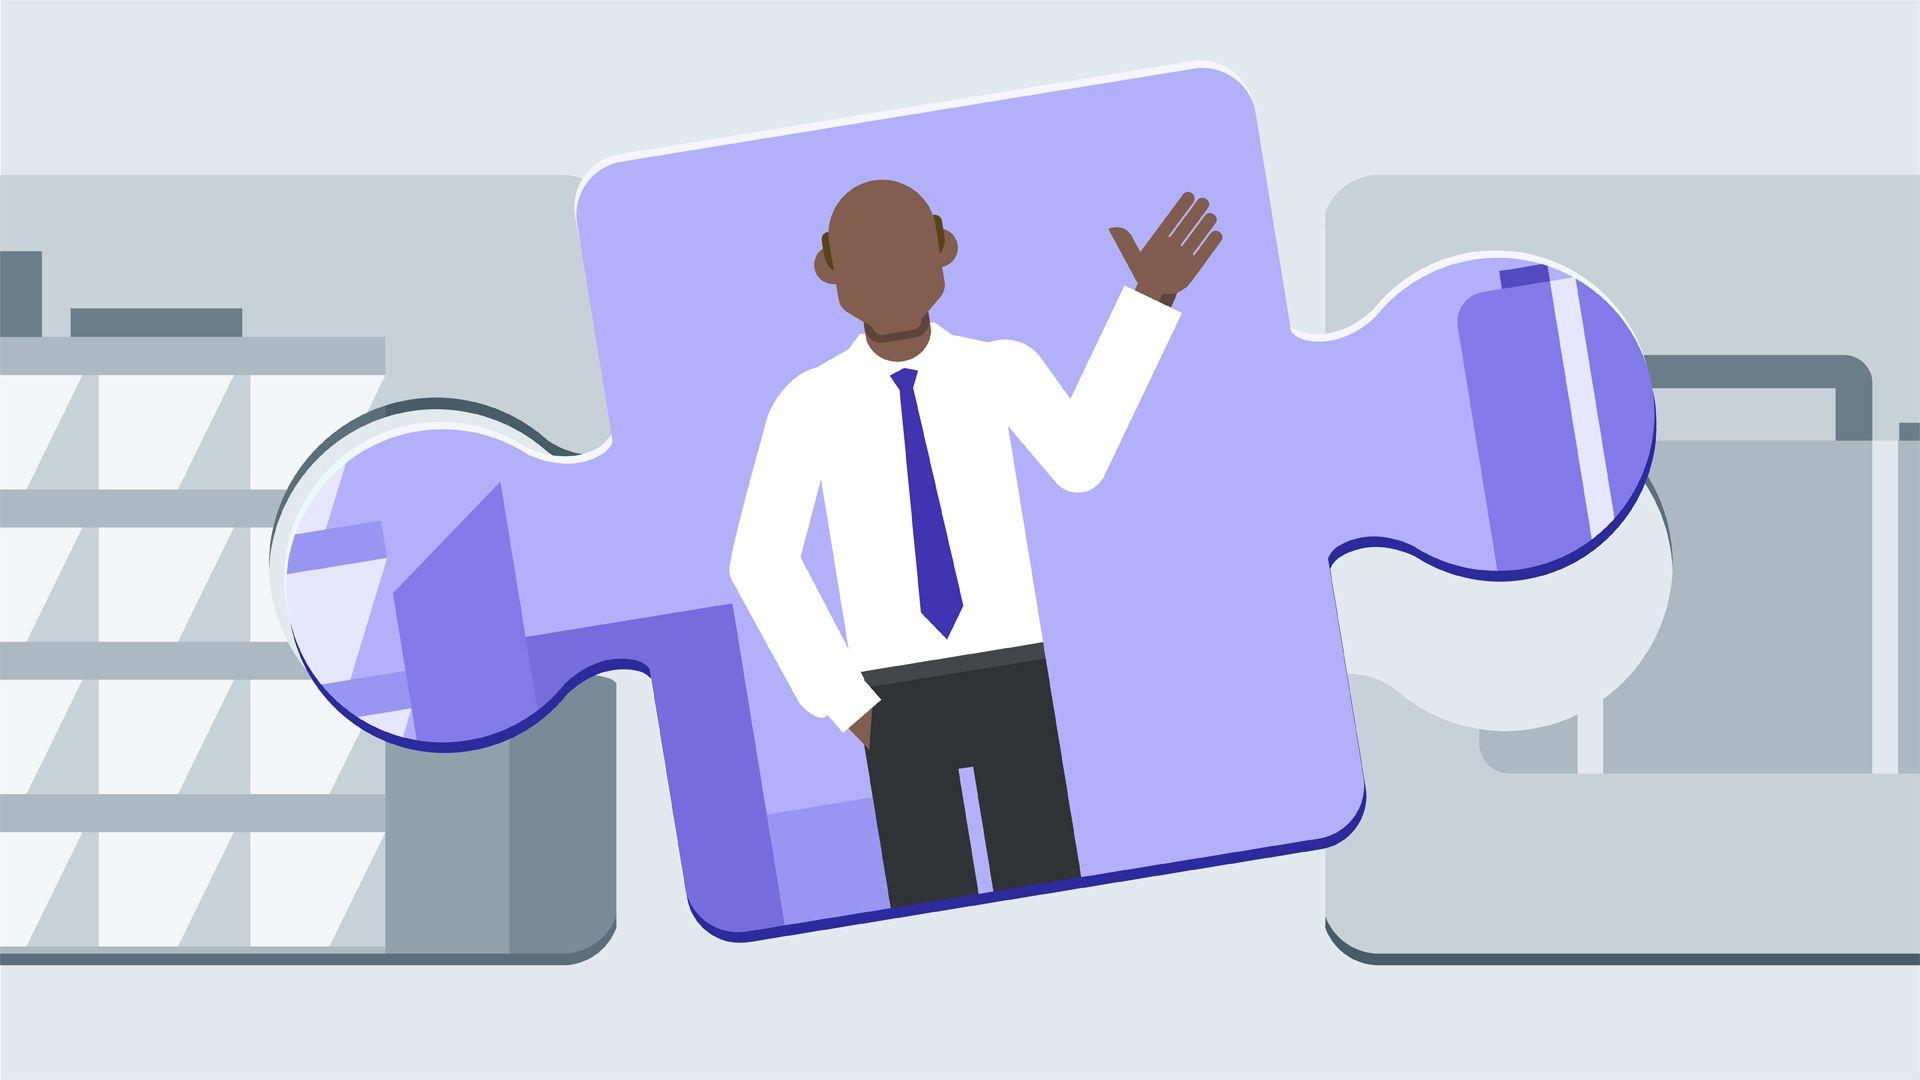 Find a job in 2020 business skills recruitment